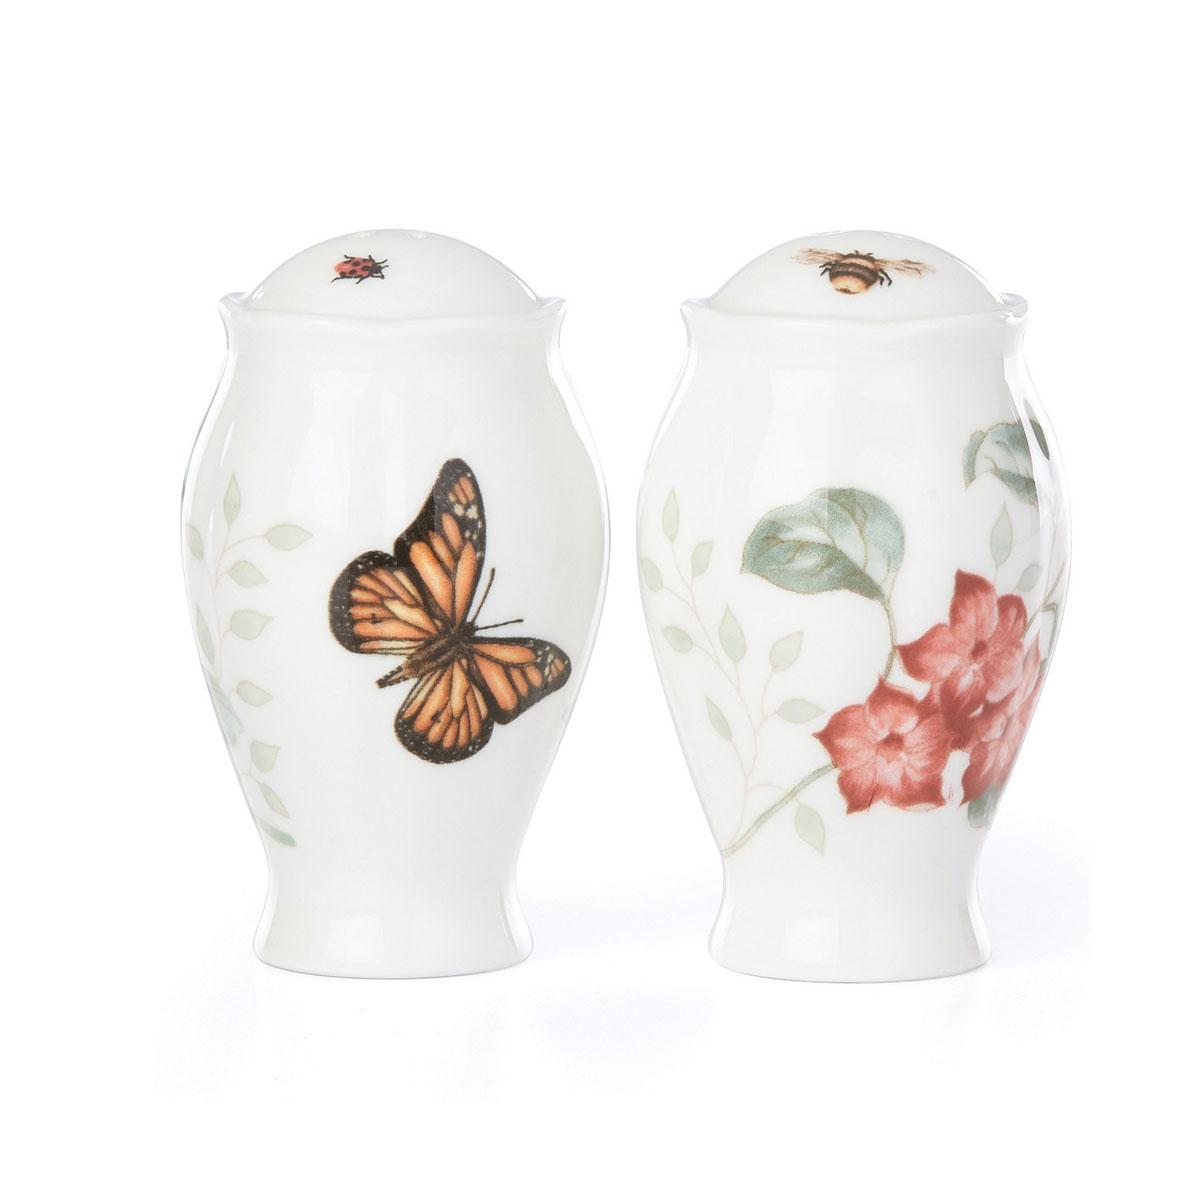 Lenox Butterfly Meadow Dinnerware Salt And Pepper Shakers